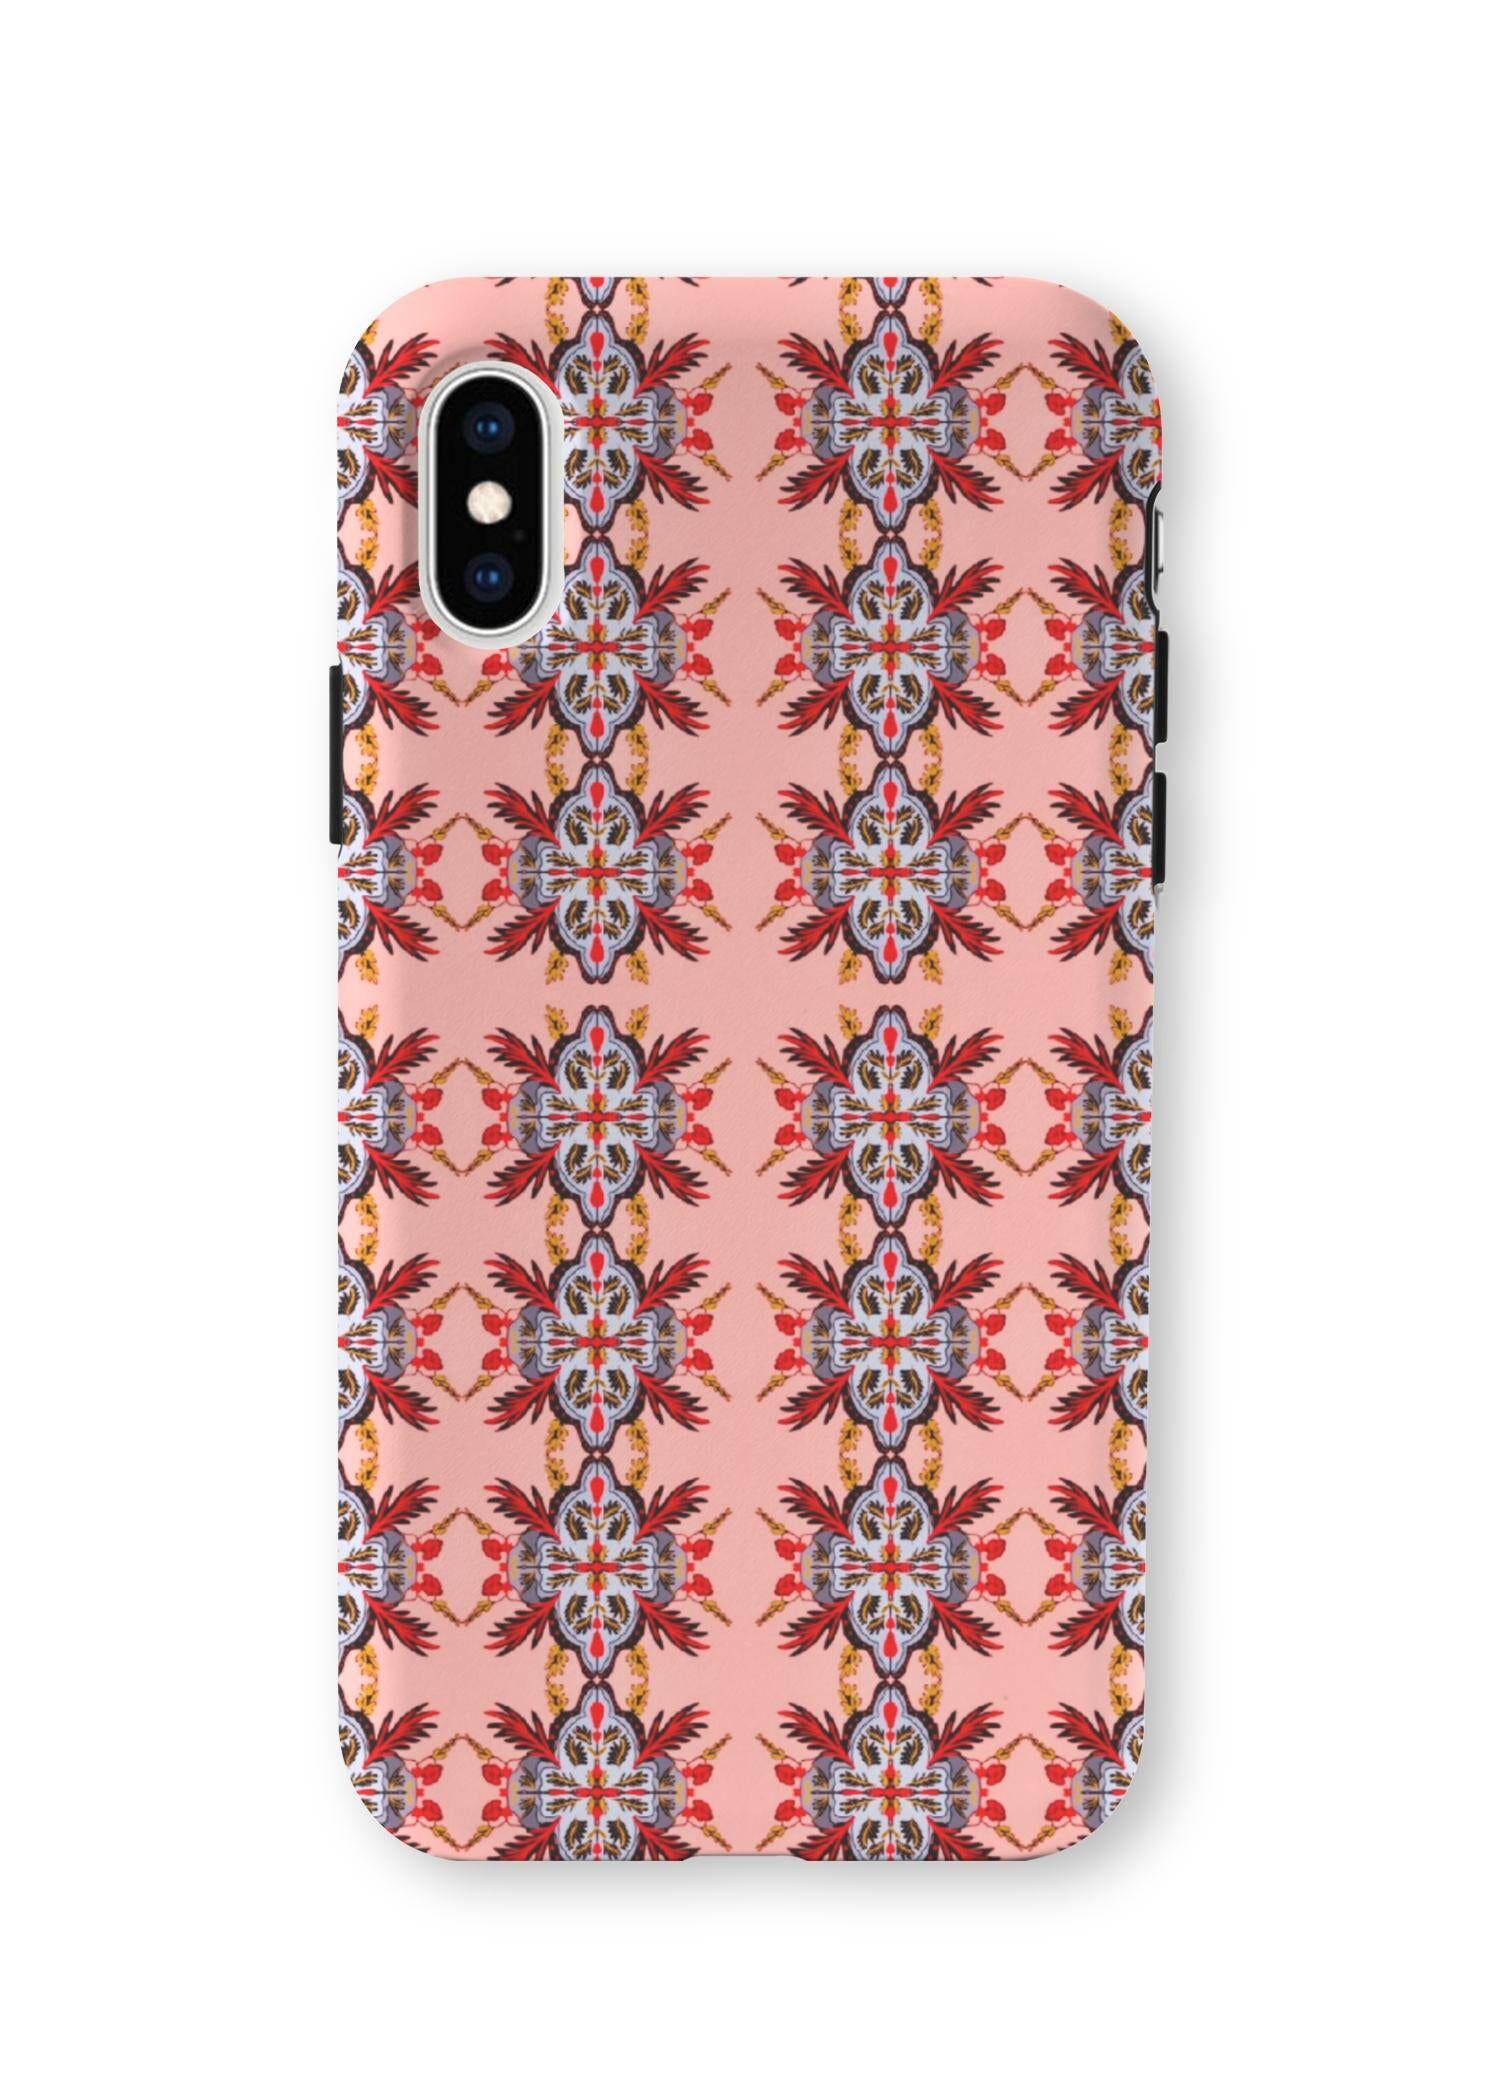 VIDA iPhone Case - Old Fashion by VIDA Original Artist  - Size: Extra Small